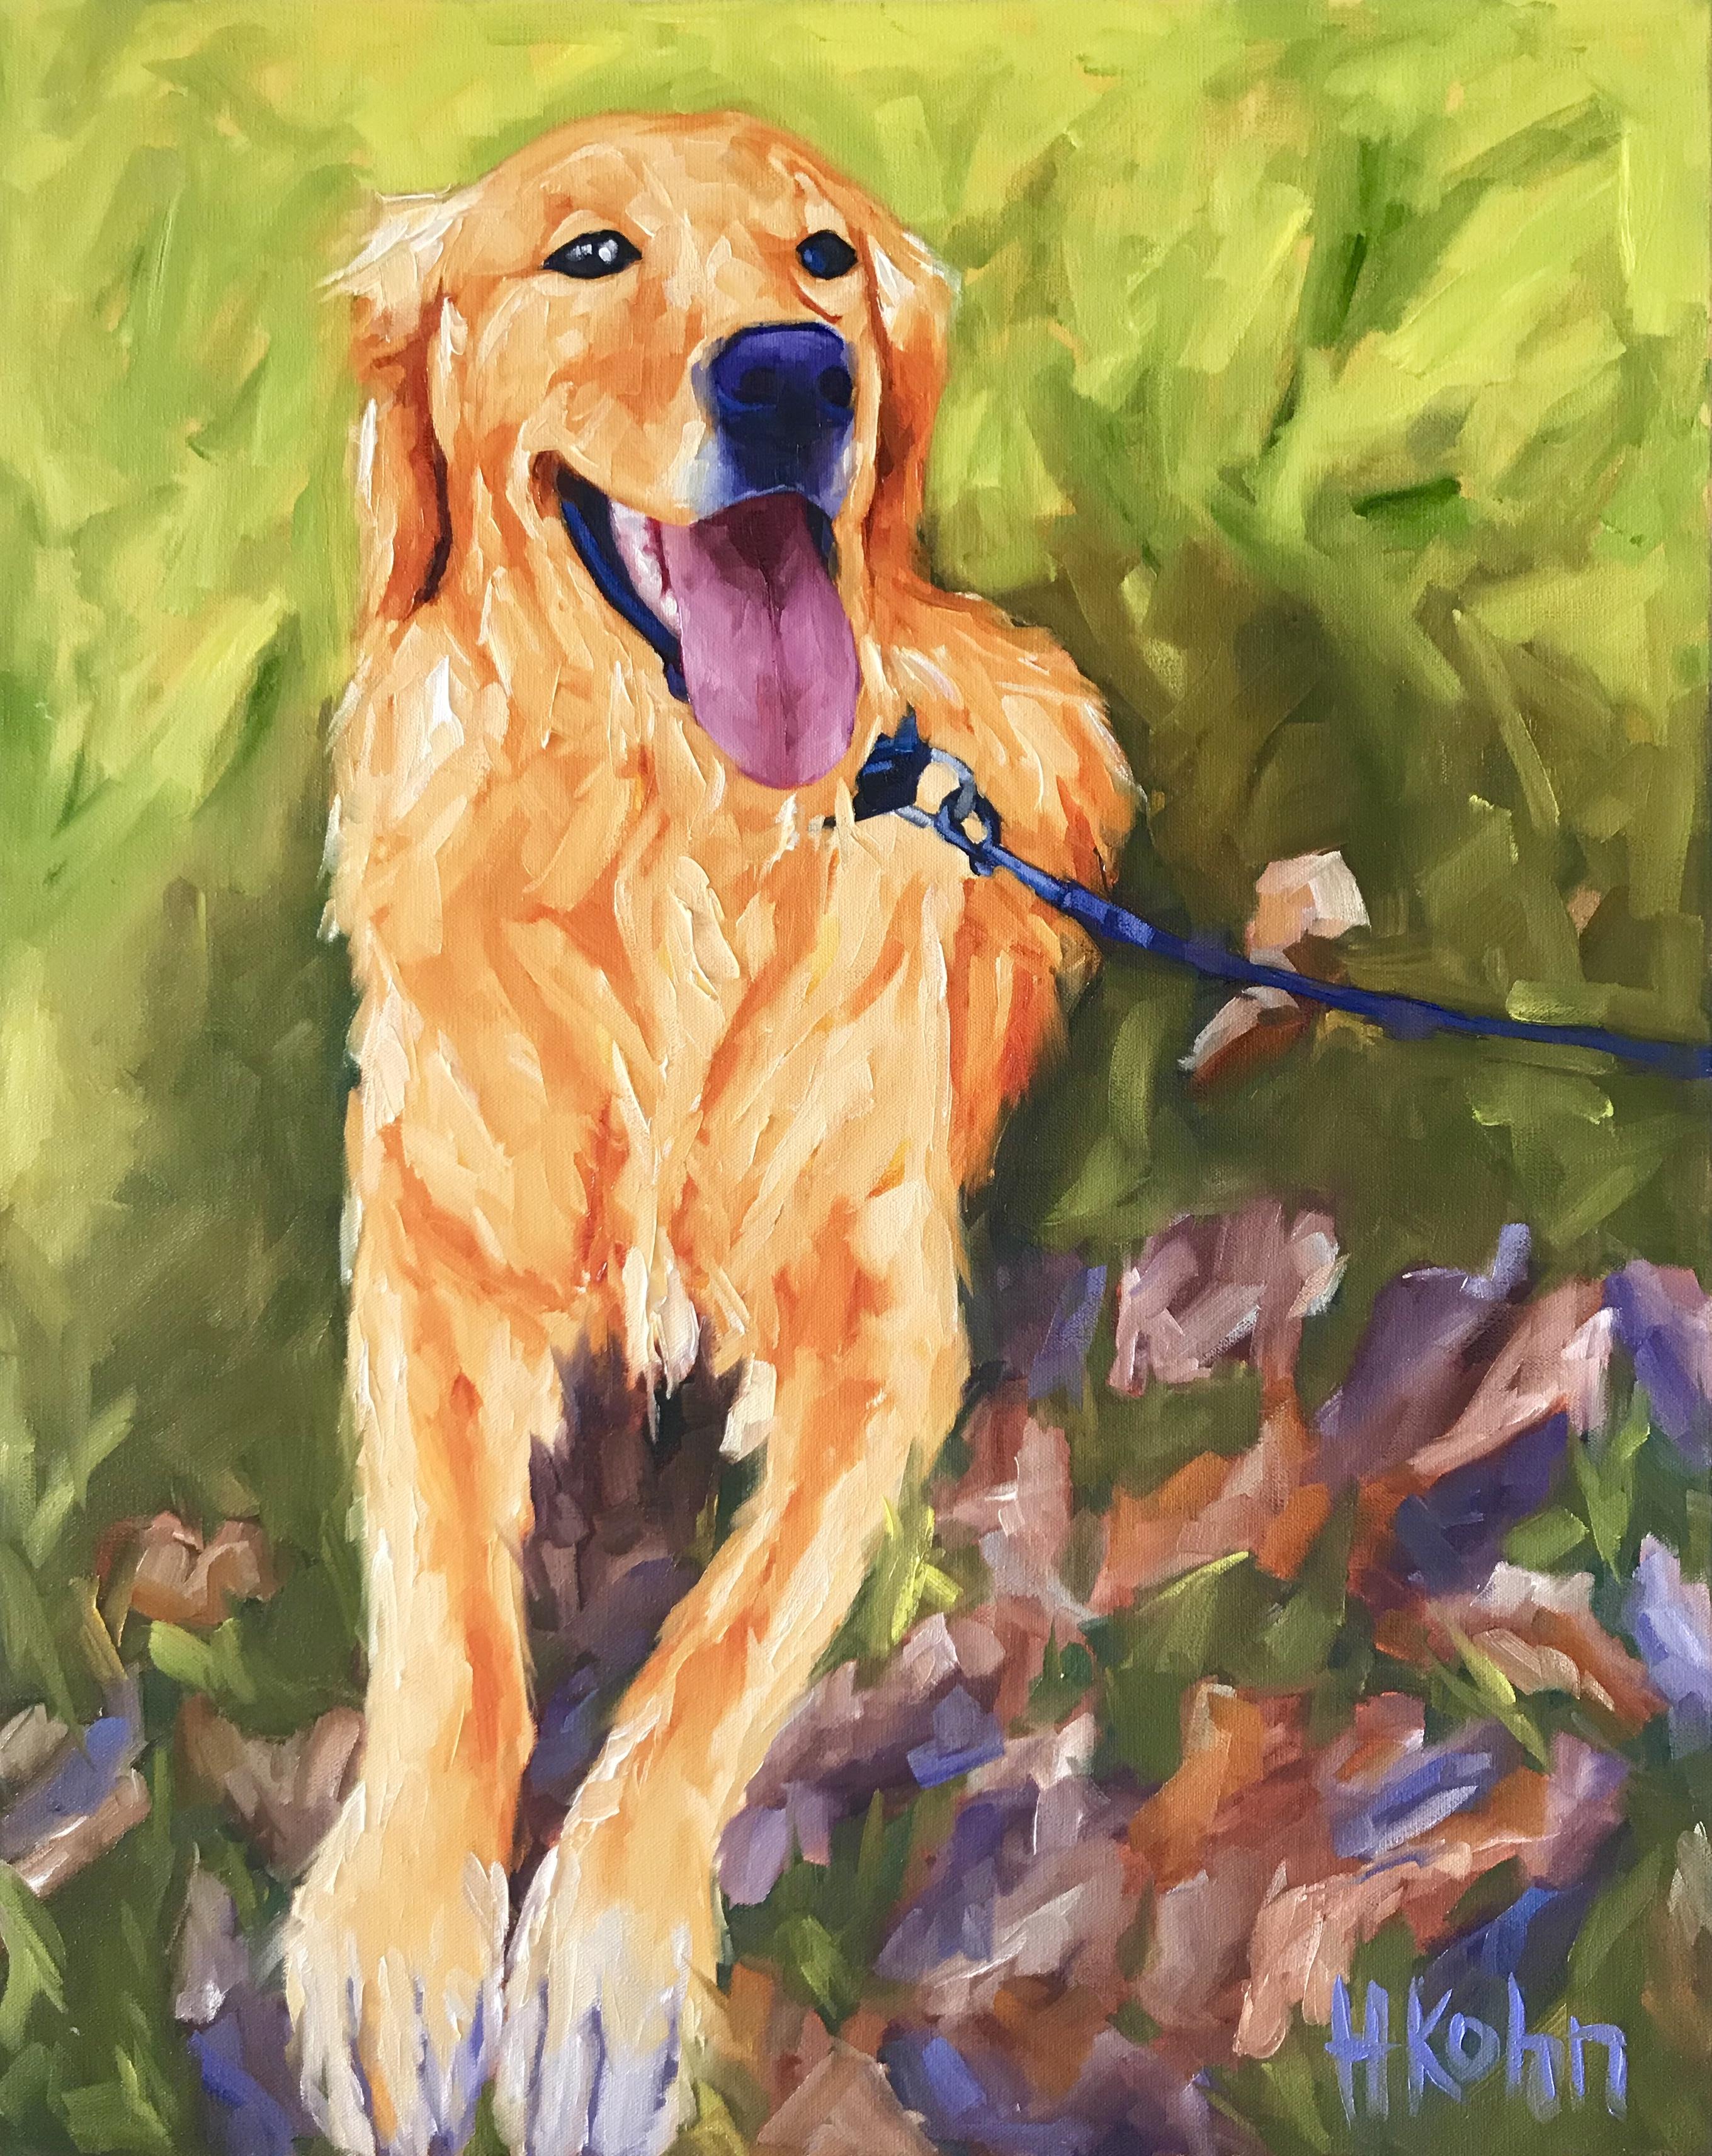 Dog-Brody